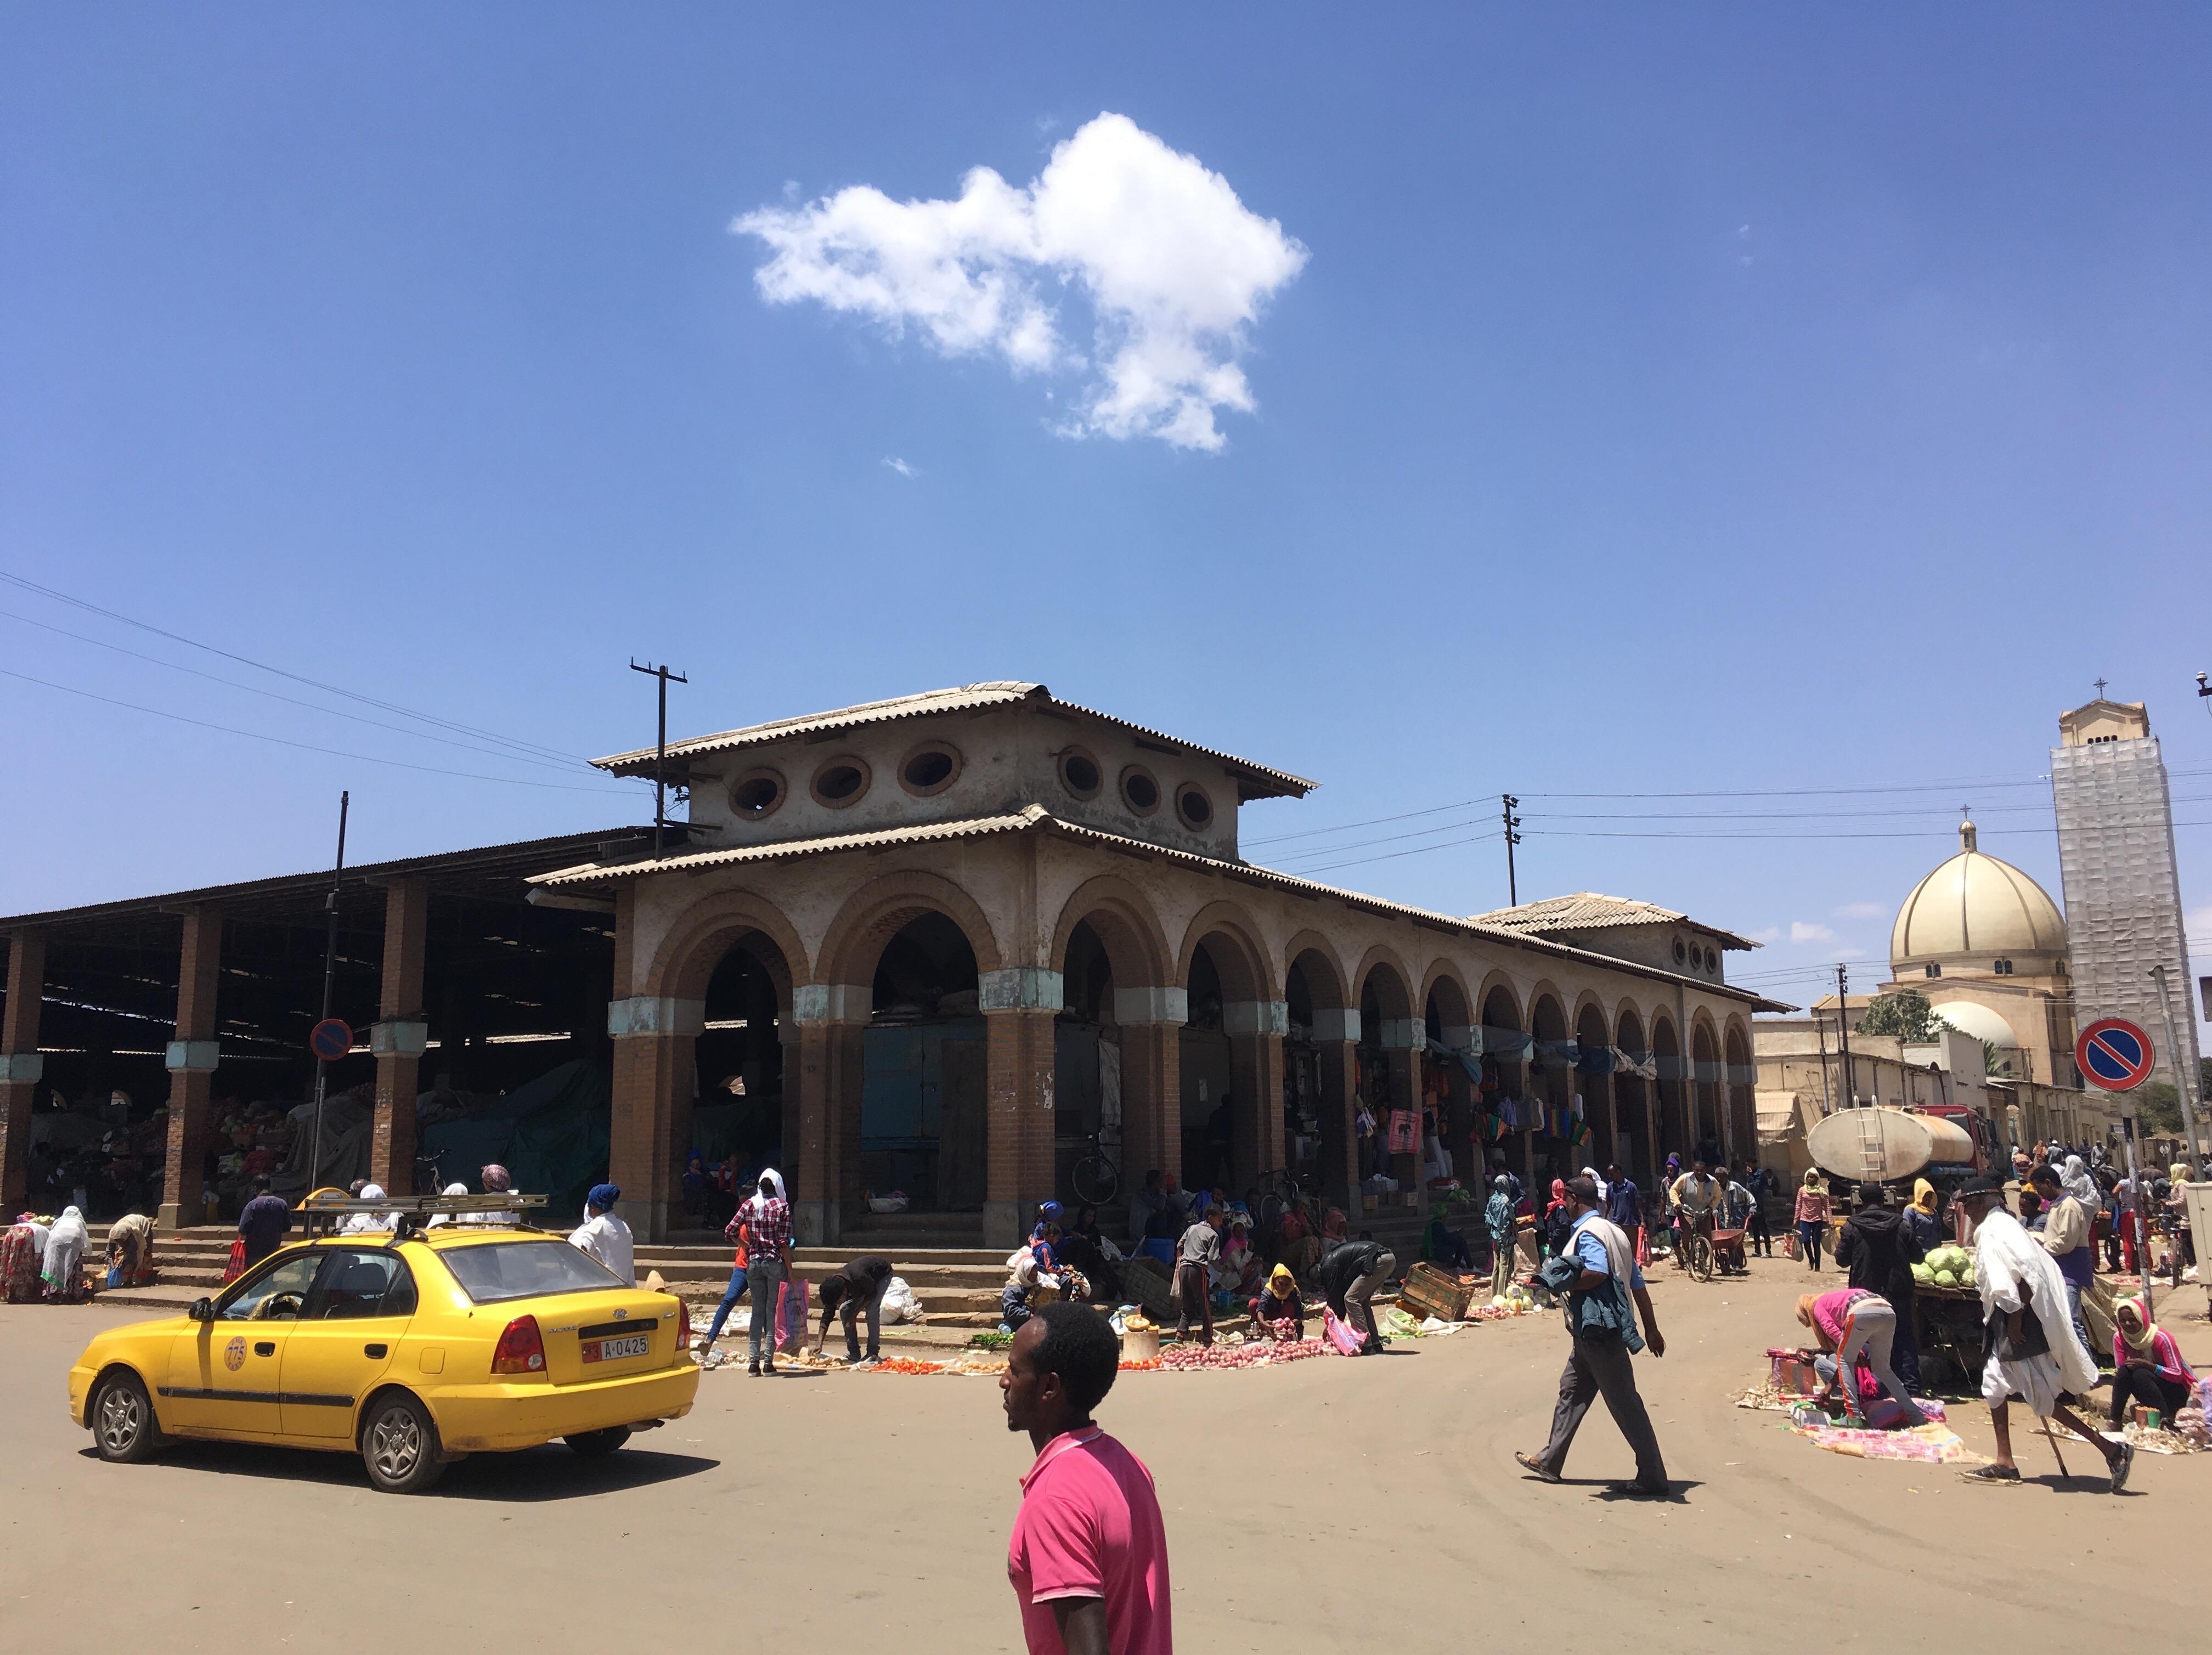 Market place in Asmara.